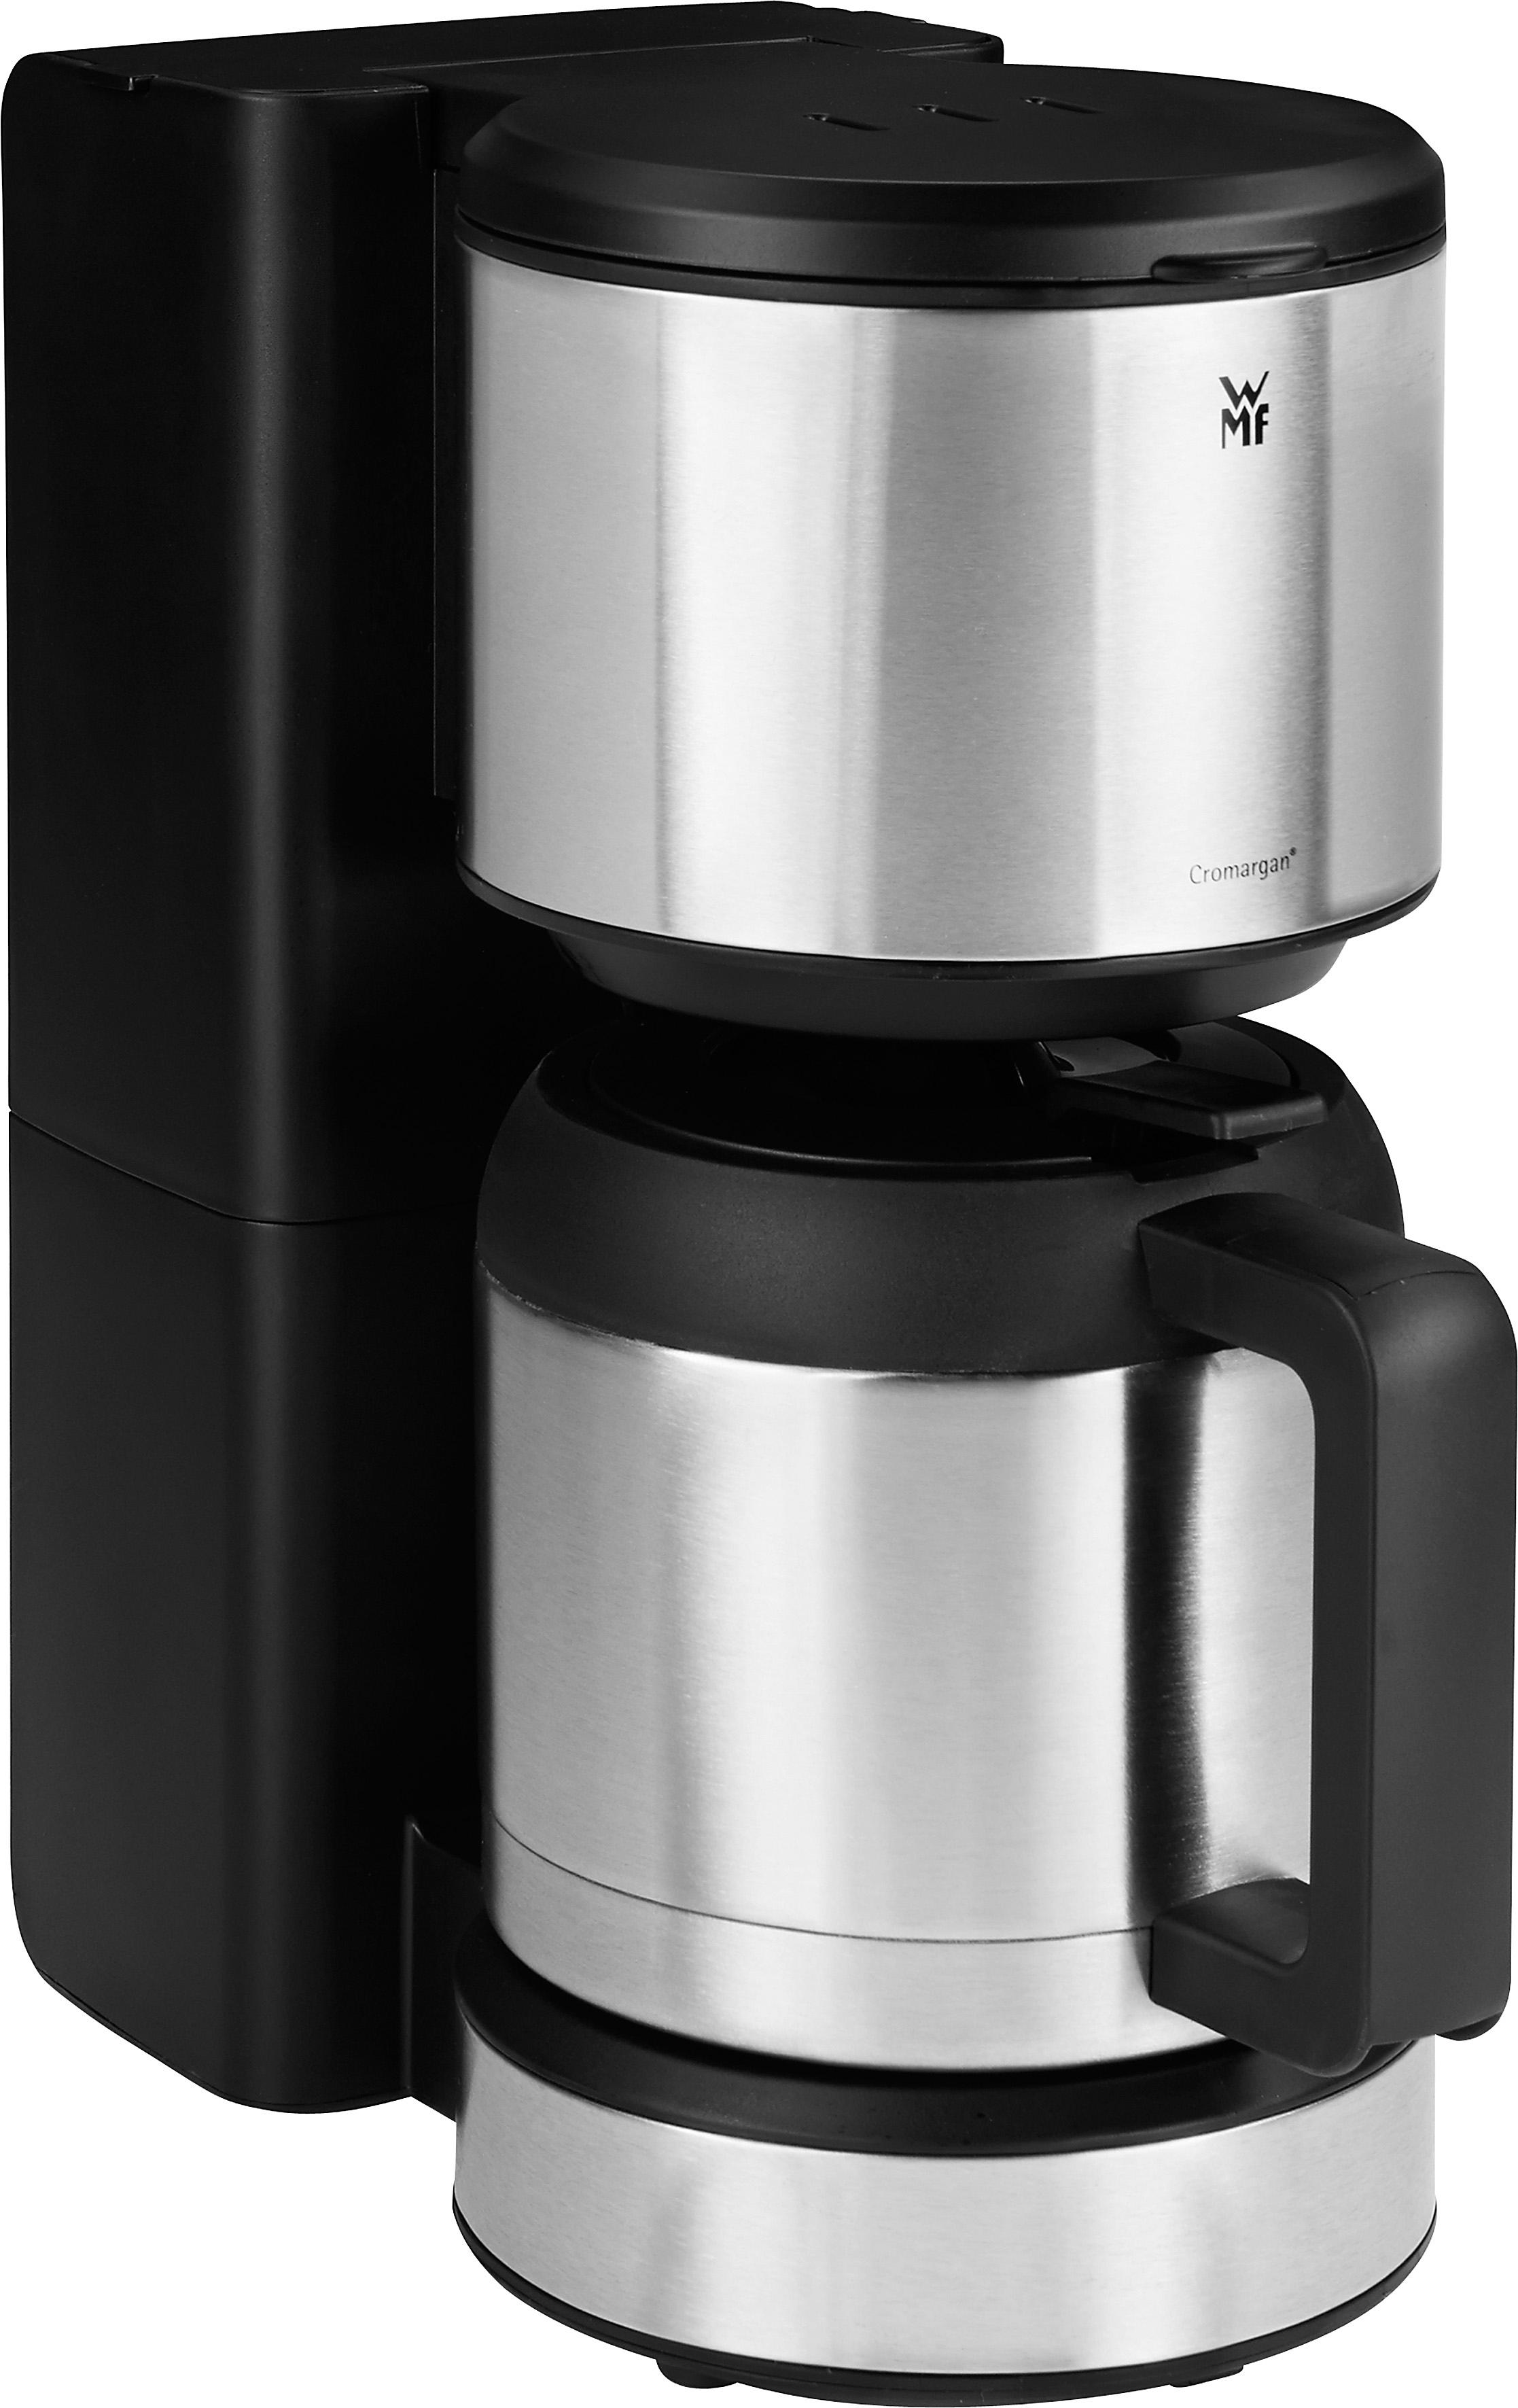 WMF filterkoffieapparaat Stelio Aroma, 1 l, met thermoskan goedkoop op otto.nl kopen